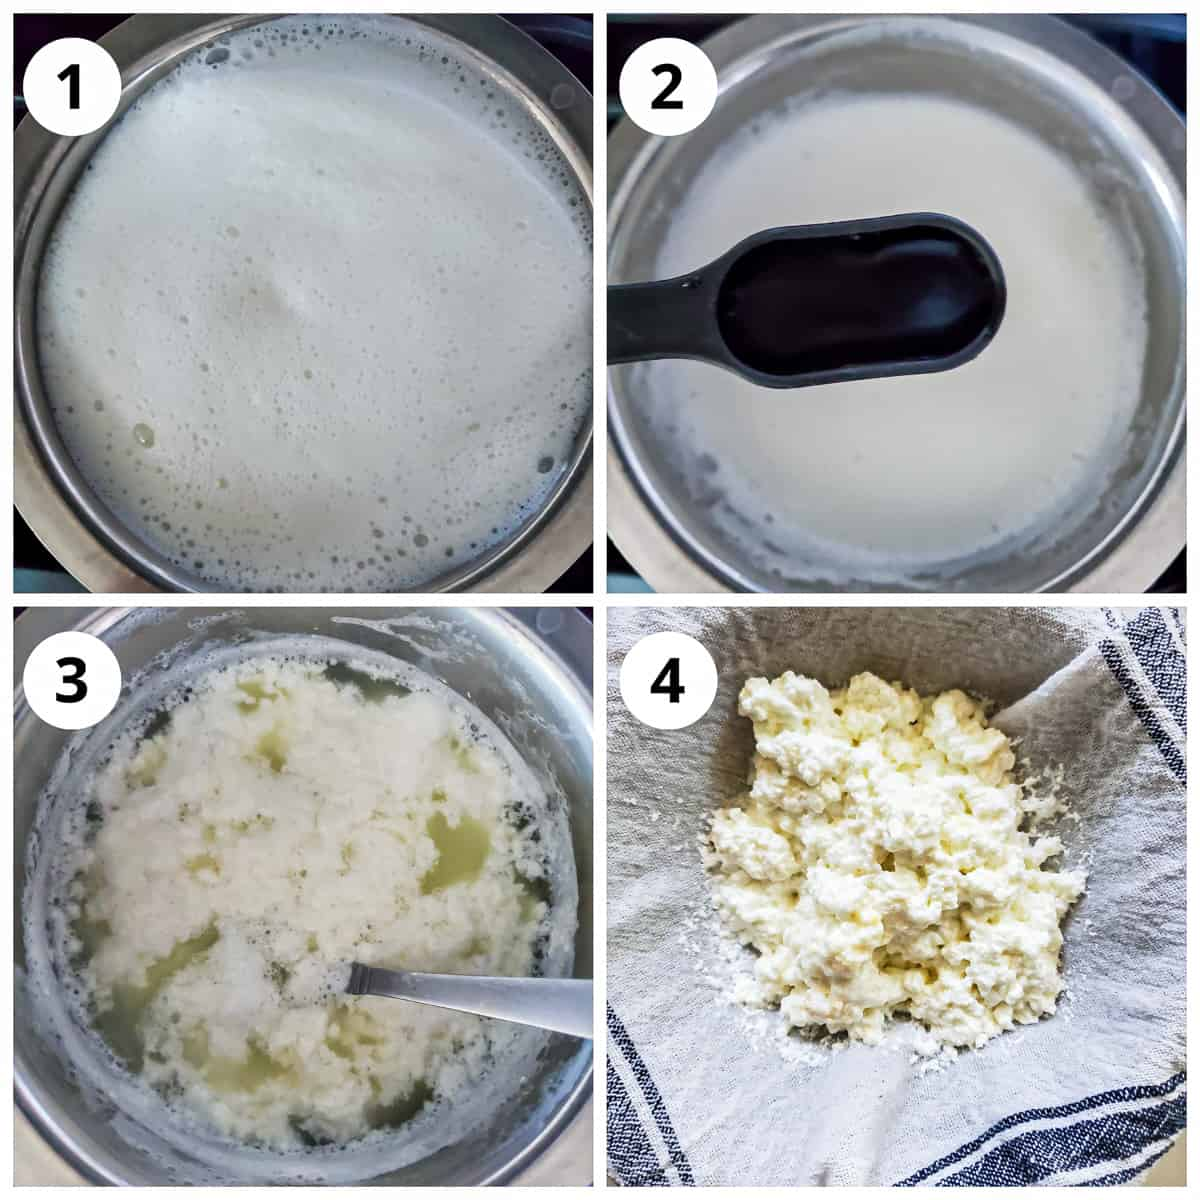 Steps for boiling milk, adding vinegar to curdle milk